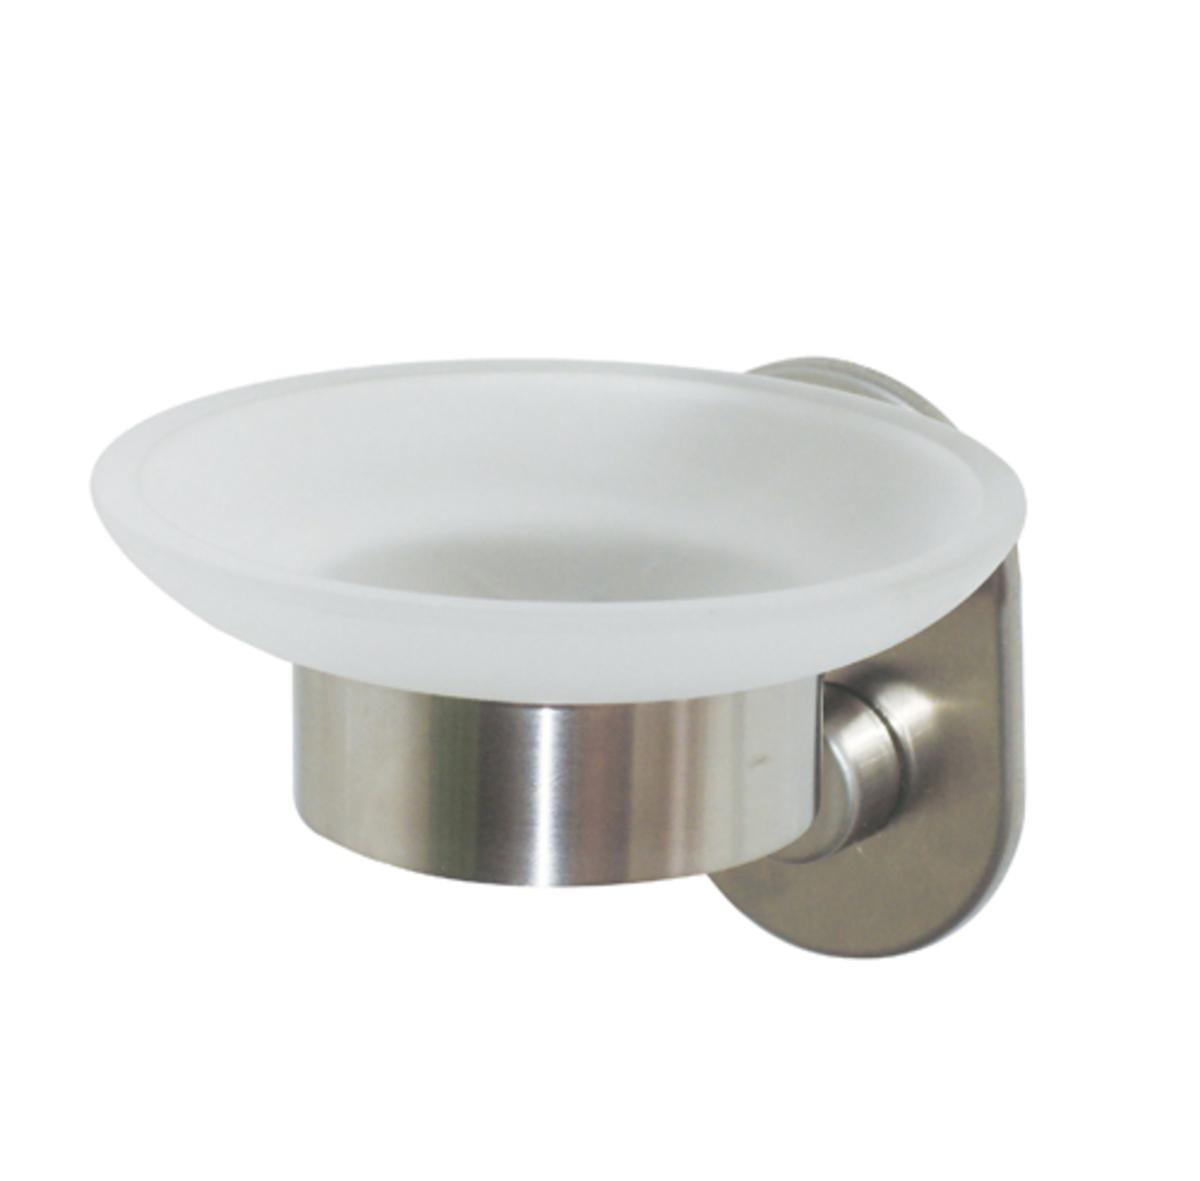 NAILOFREE 免鑽牆 - 肥皂盆 7912